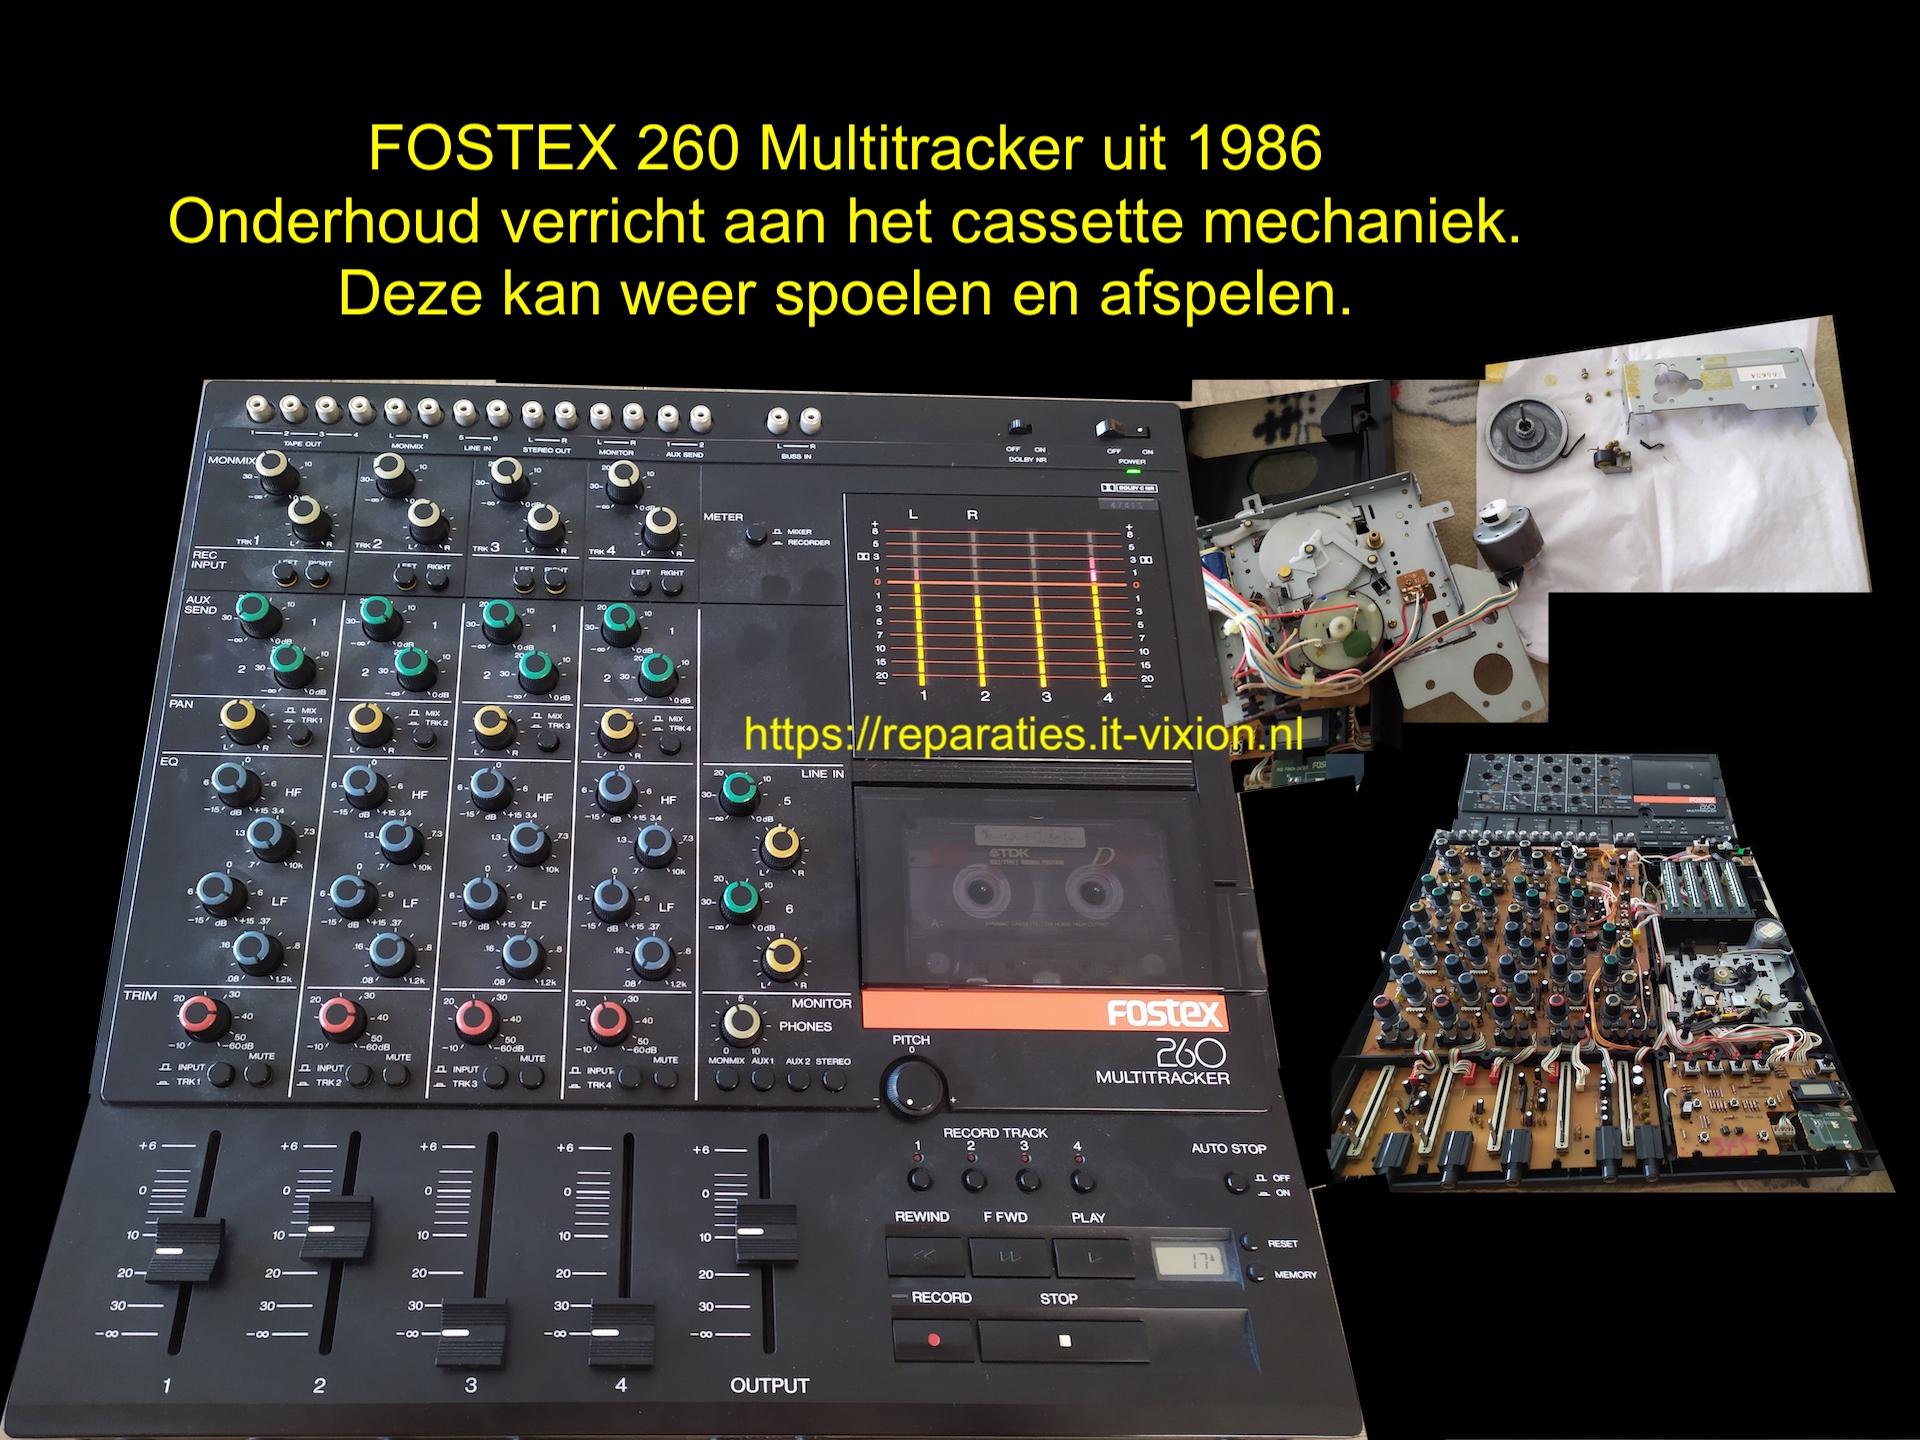 Fostex260 Multitracker uit 1986